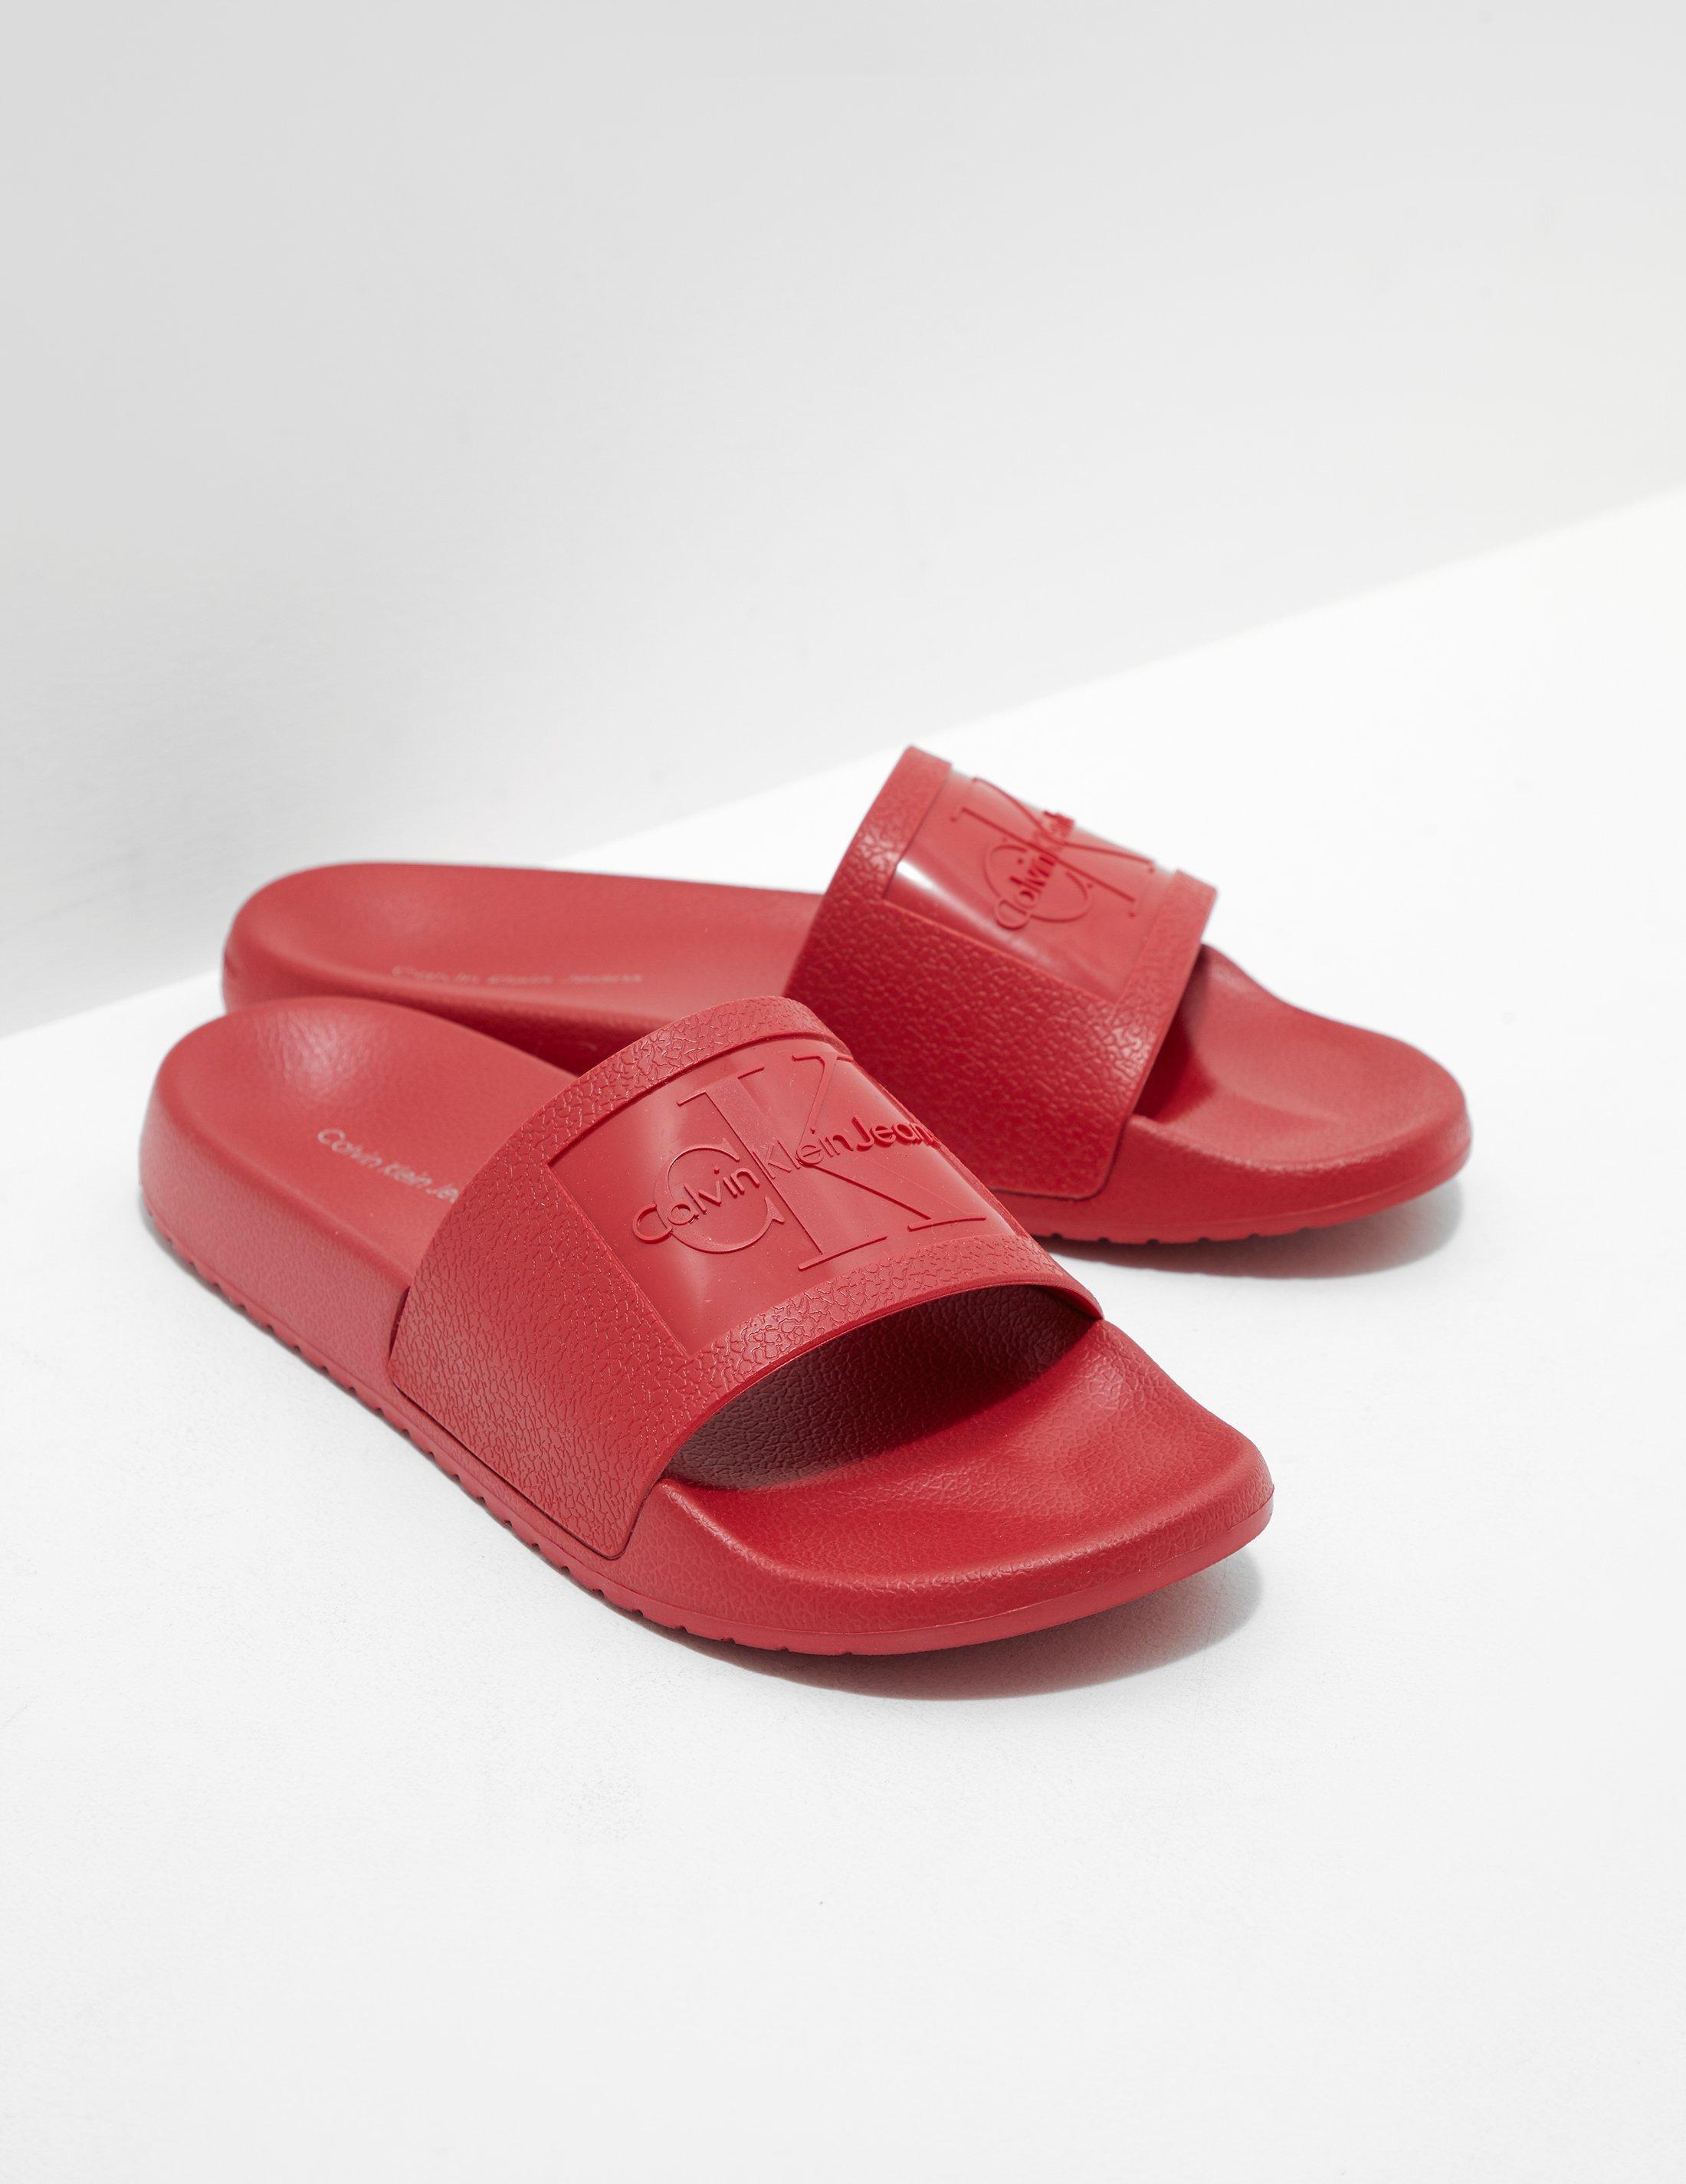 Lyst - Calvin Klein Womens Christie Slides Women s Red in Red 92a8e13c4